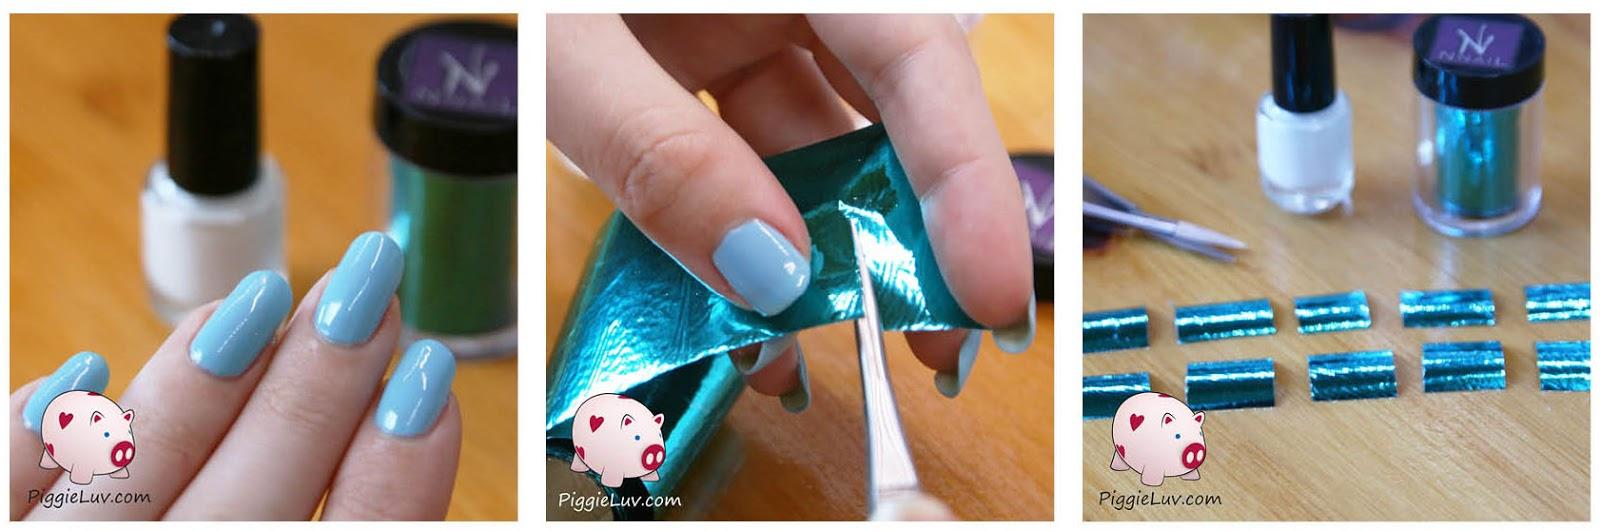 PiggieLuv: Nail foil tutorial from KKCenterHK